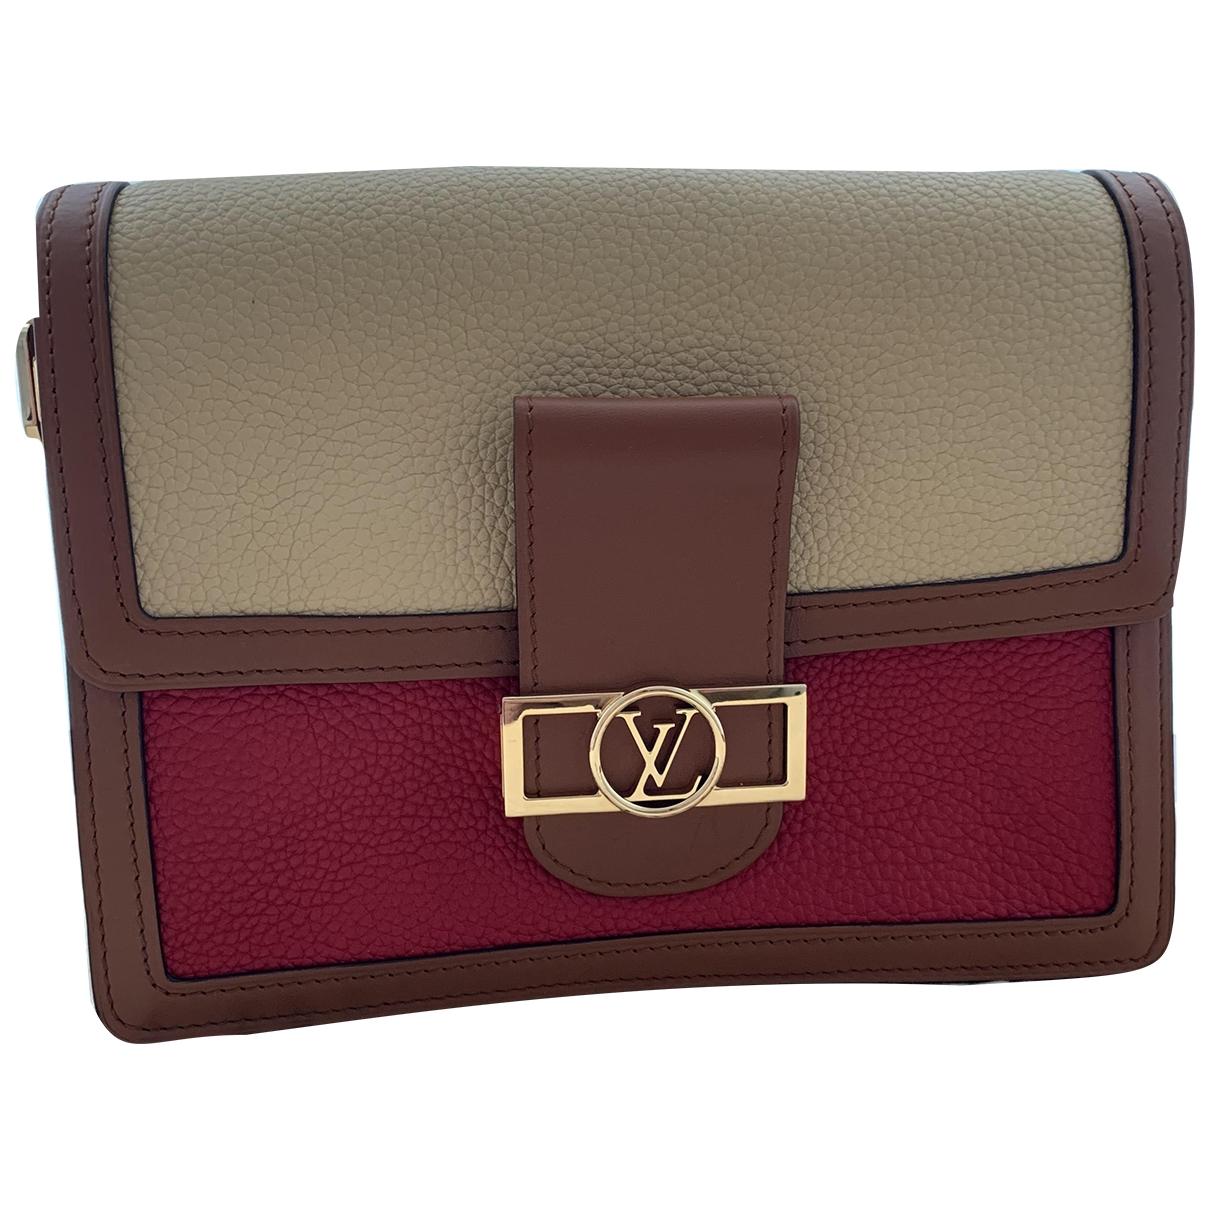 Louis Vuitton - Sac a main Dauphine MM pour femme en cuir - beige